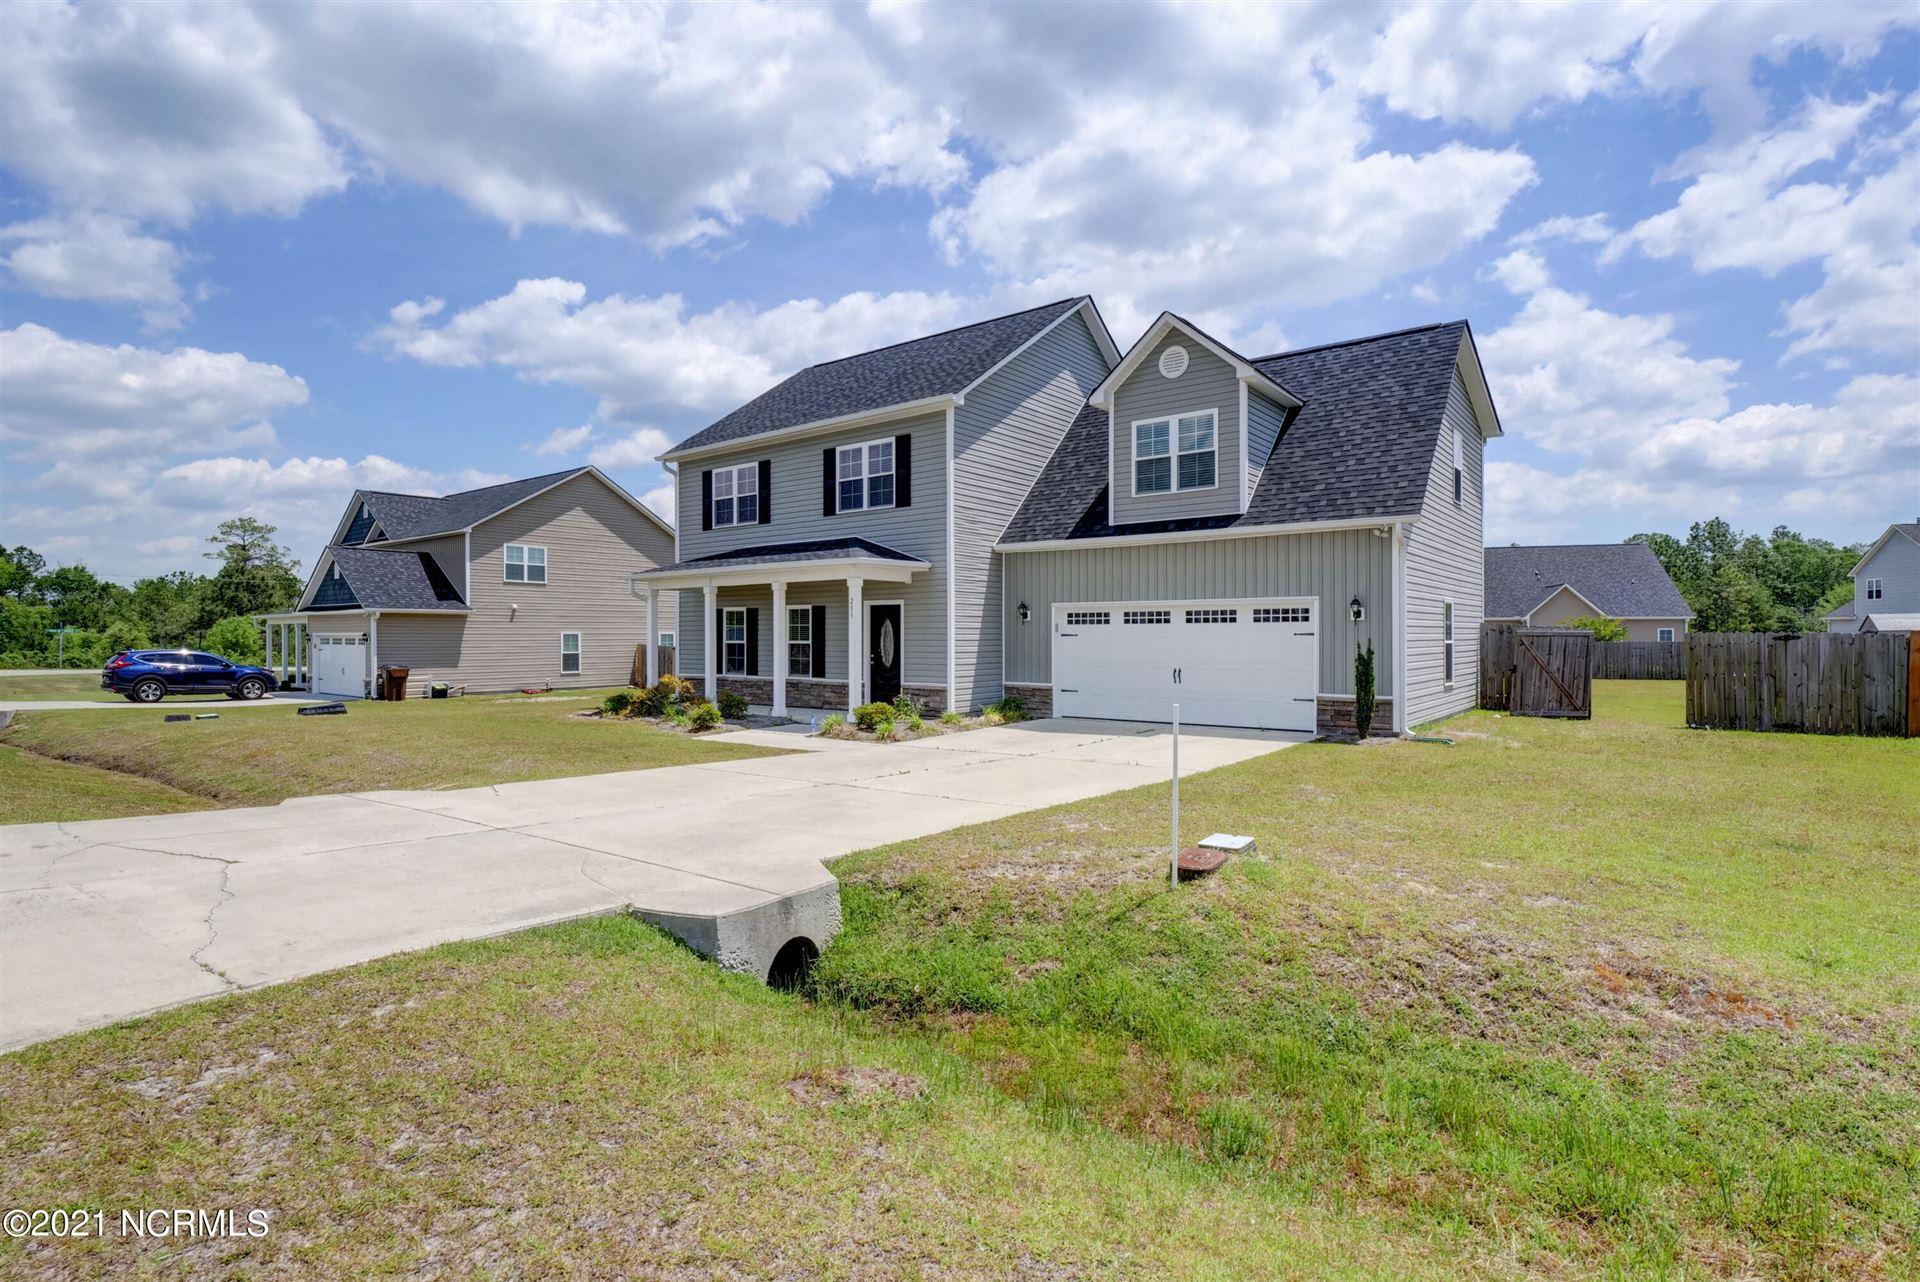 Photo of 203 Chestwood Drive, Hubert, NC 28539 (MLS # 100296226)